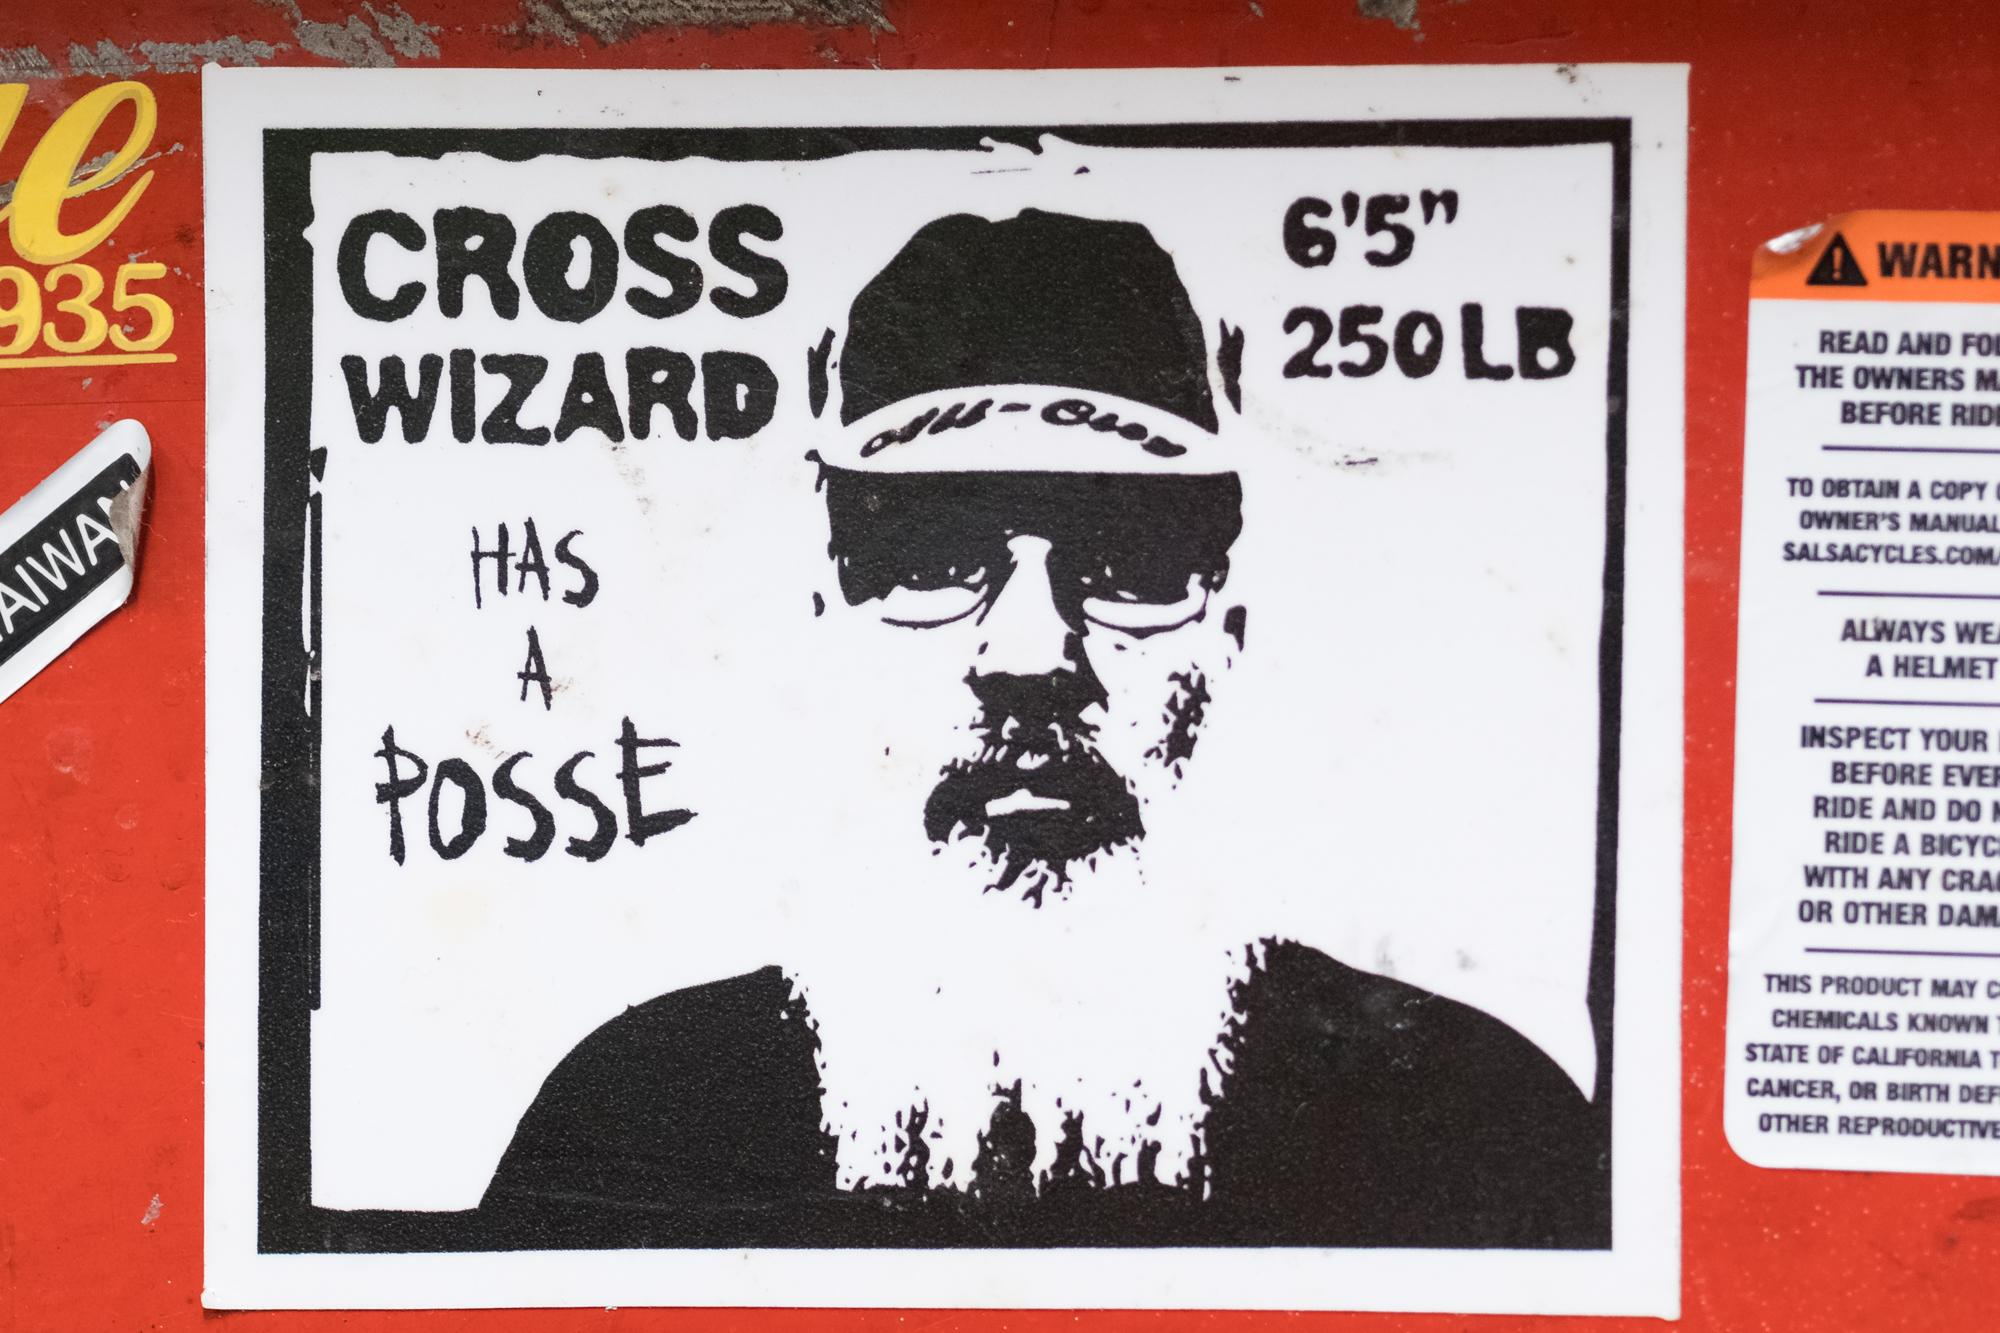 CROSS WIZARD